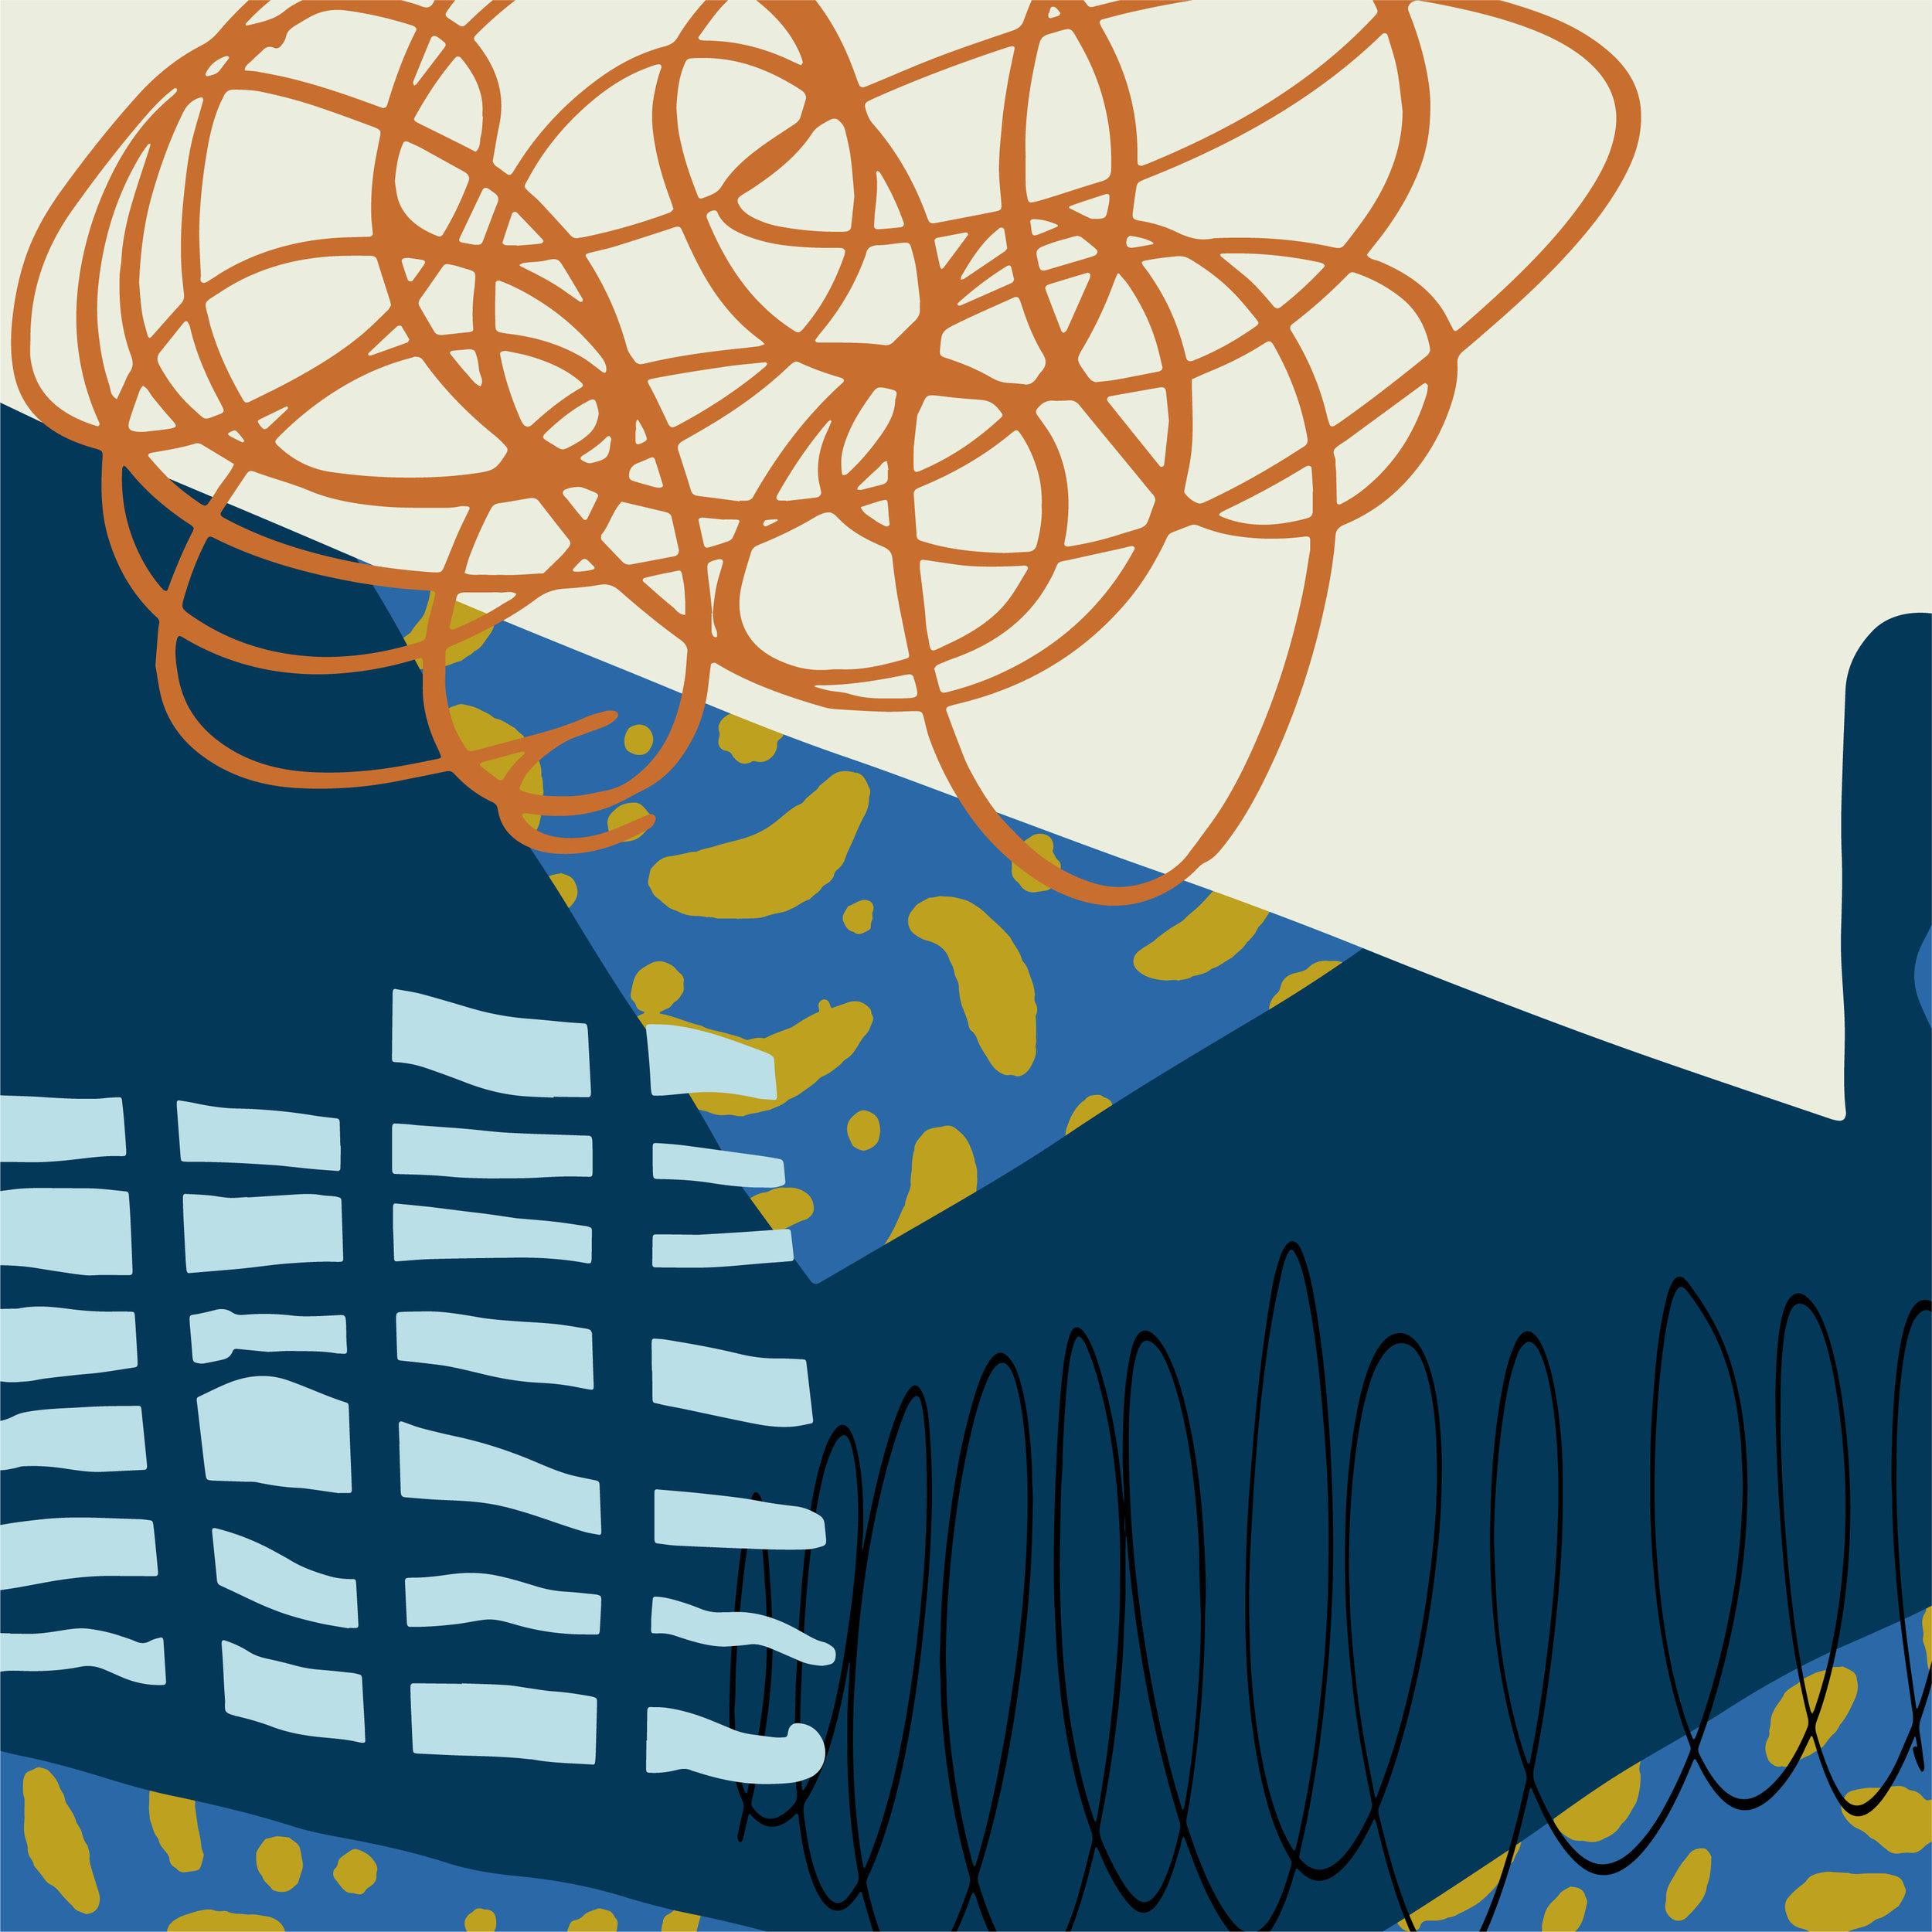 Modernshapes_artboards-08.jpg